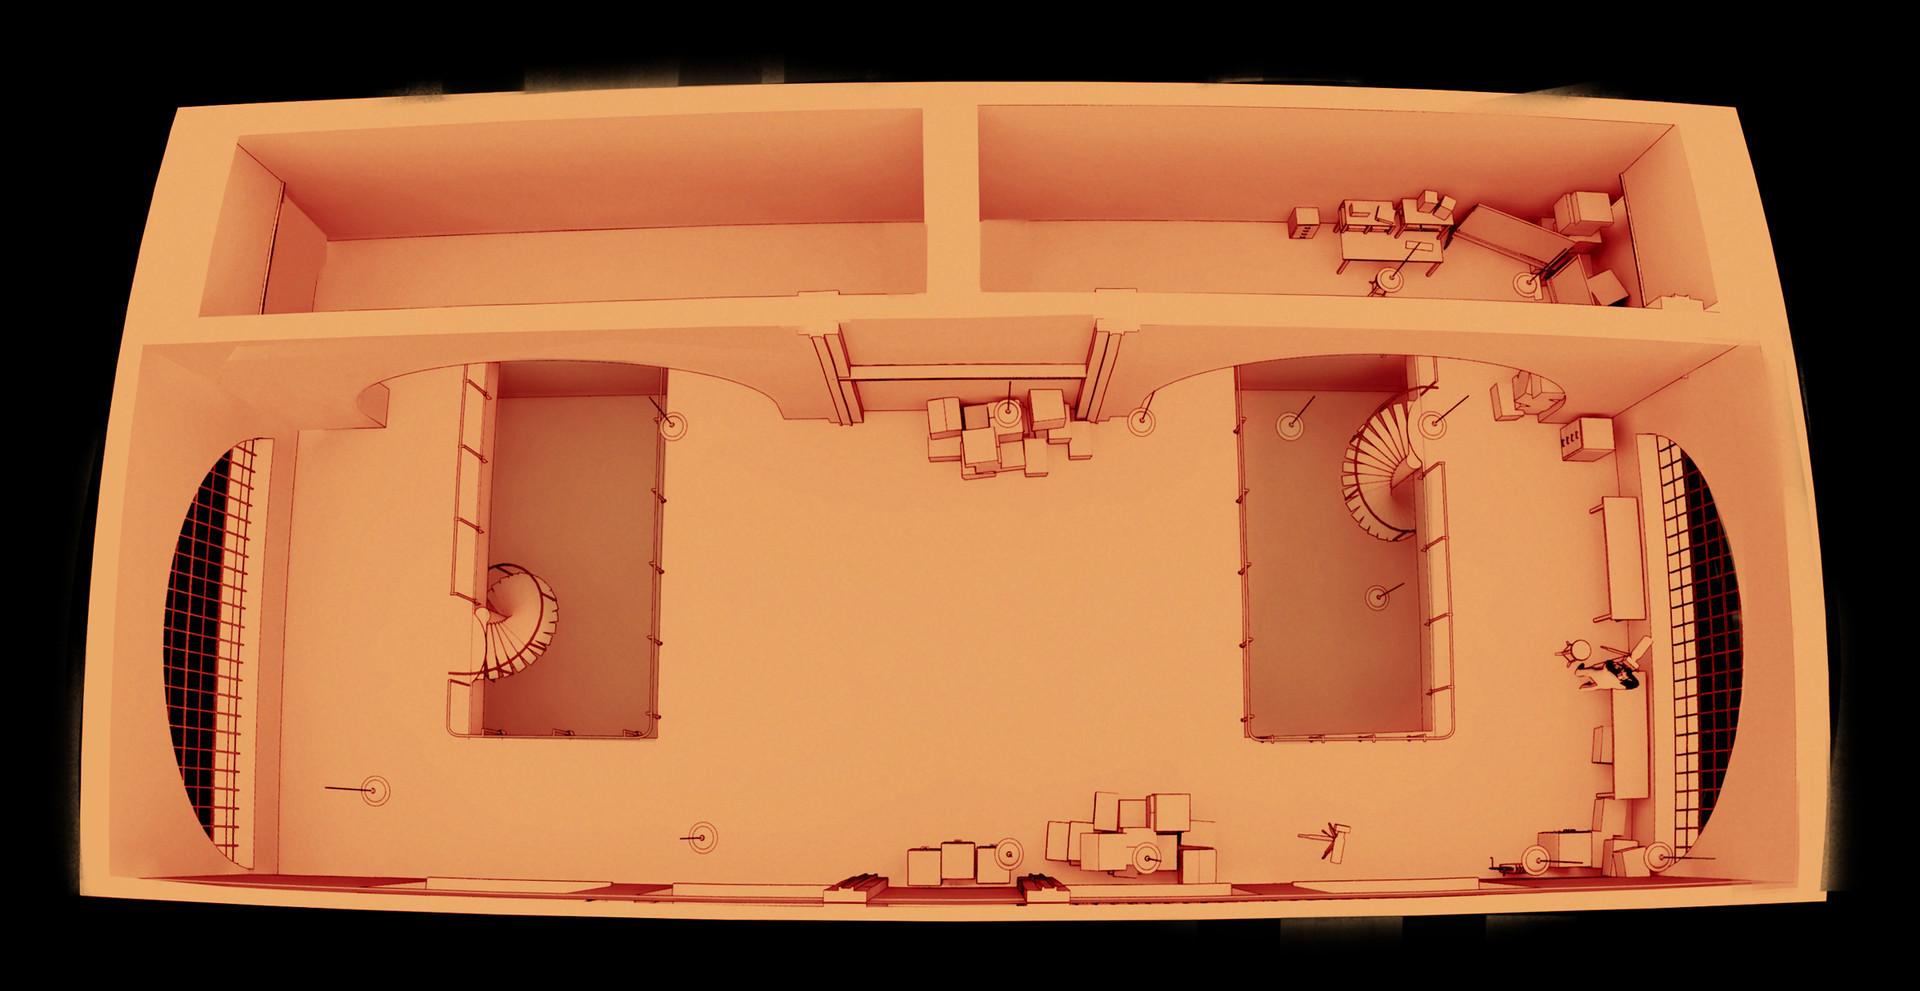 Layout: entire top floor